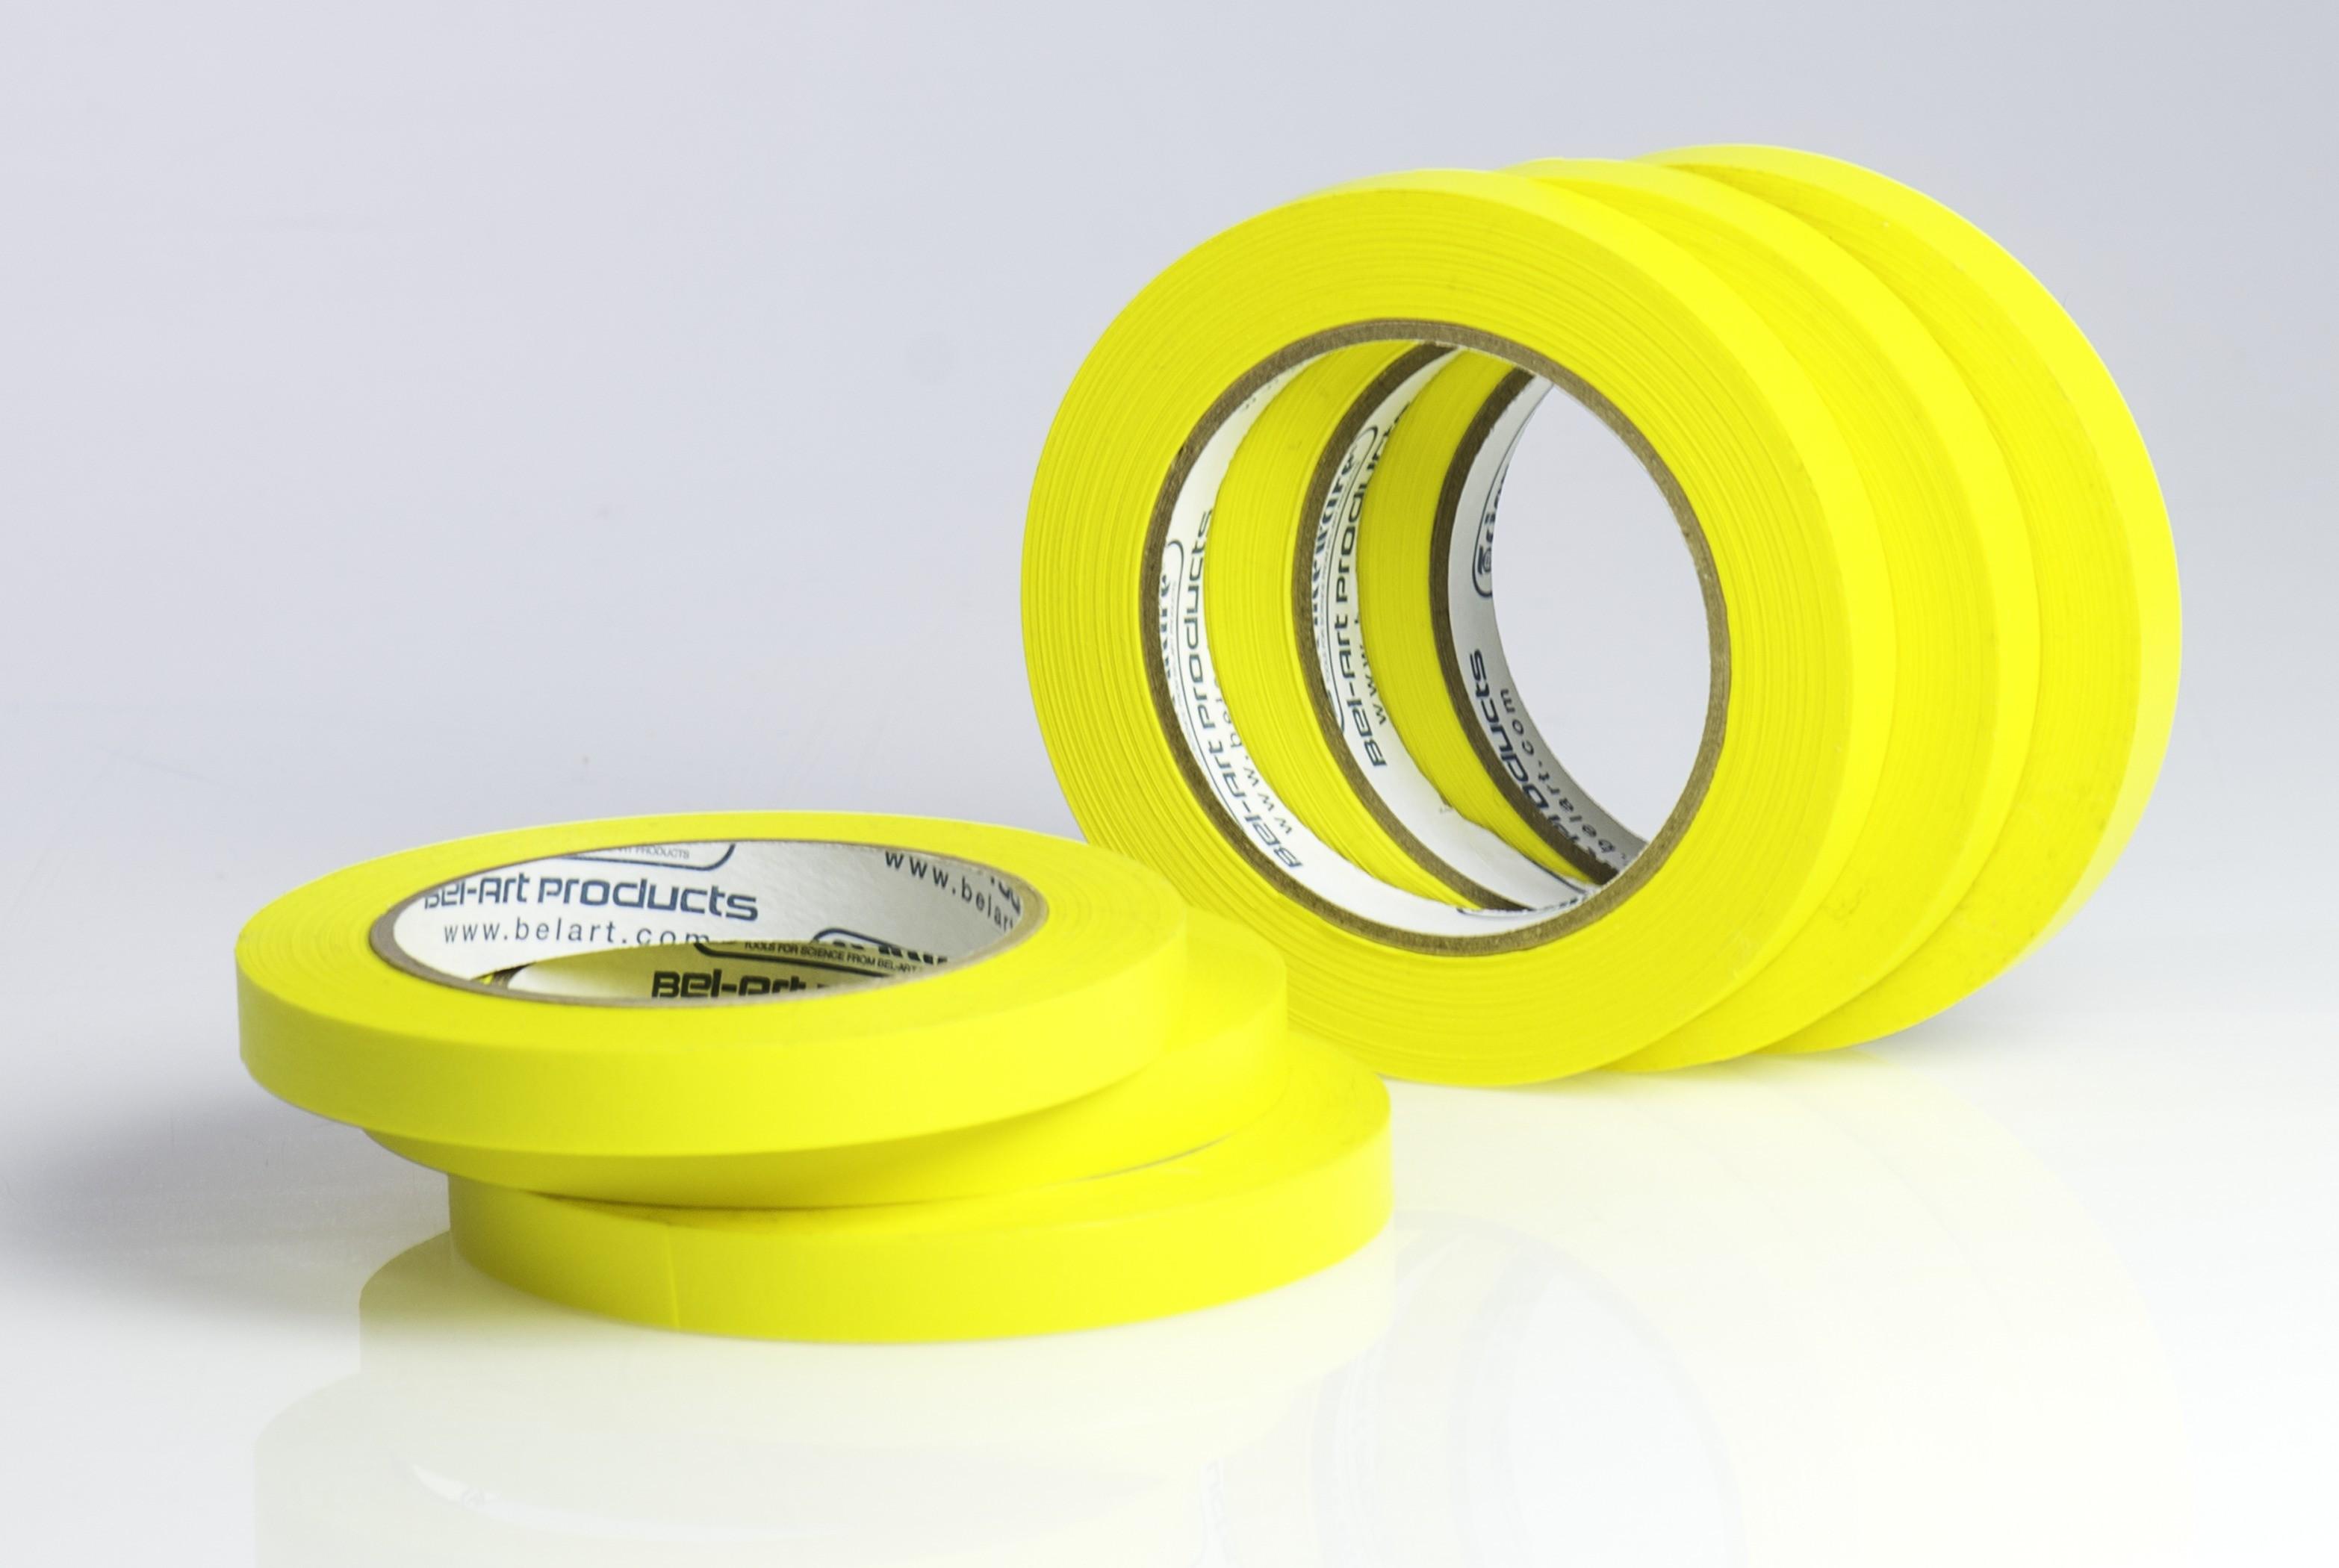 SP Bel-Art Write-On Yellow Label Tape; 40yd Length, ¹/₂ in. Width, 3 in. Core (Pack of 6)